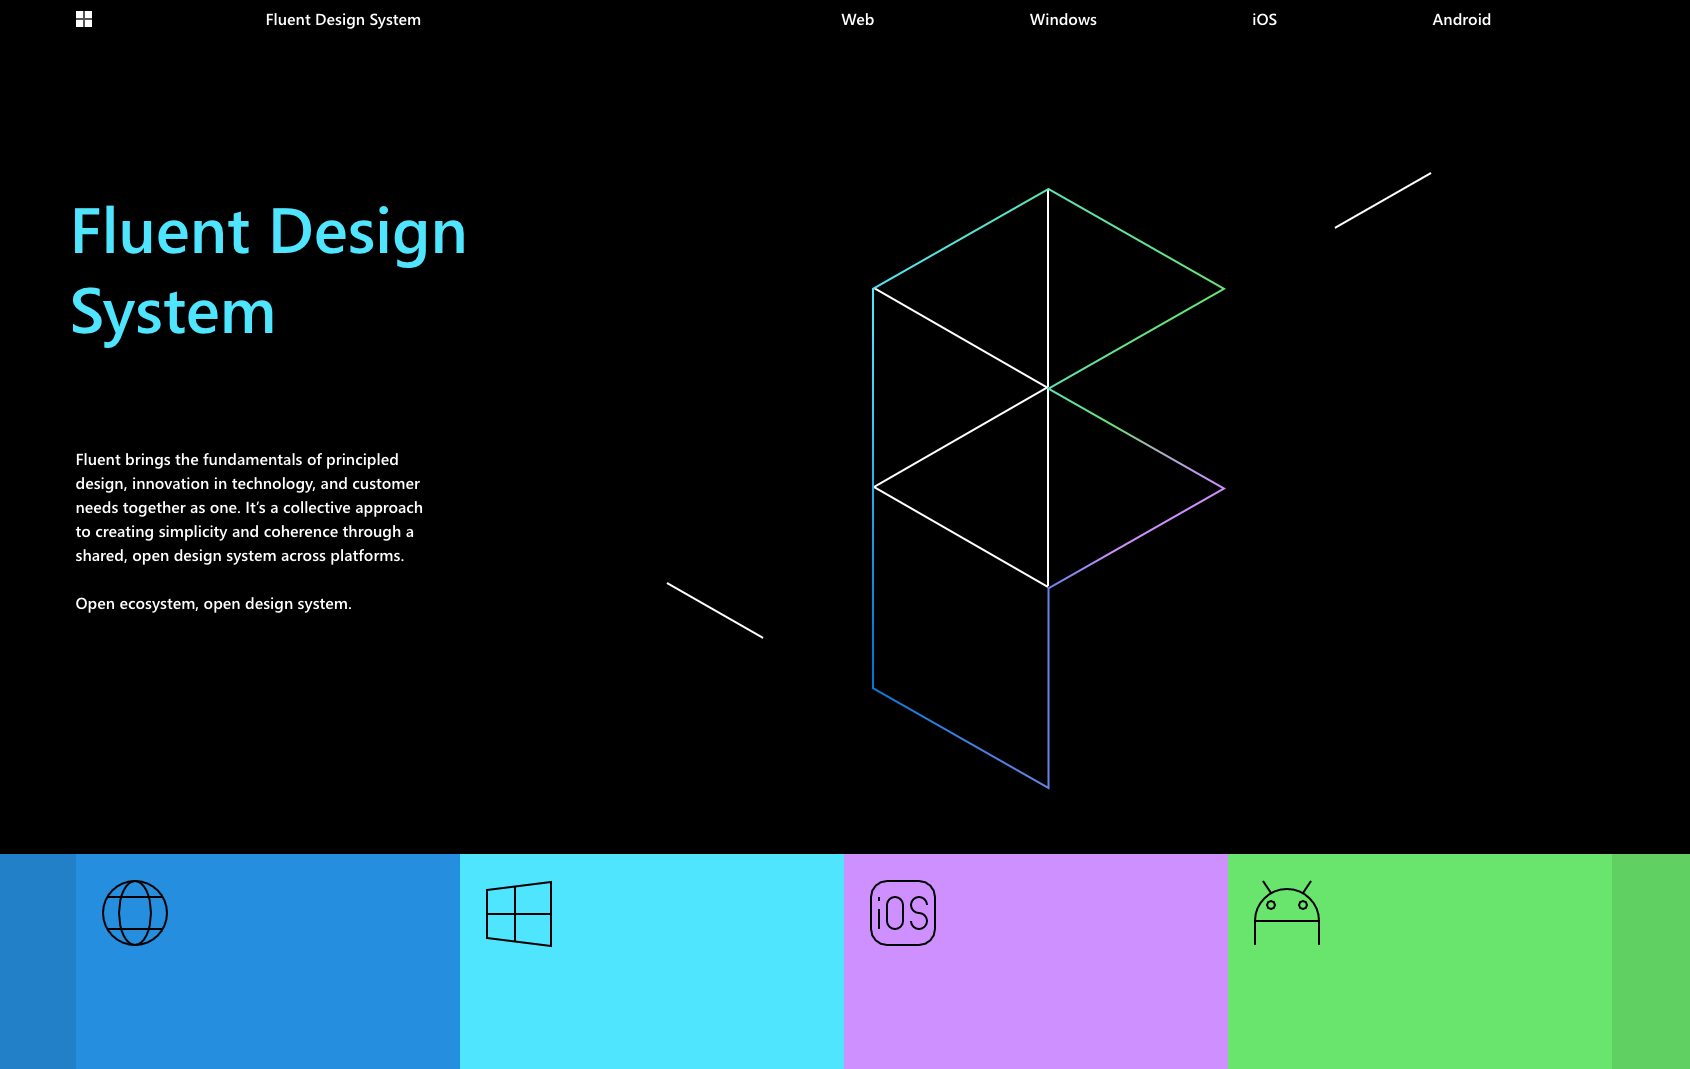 Microsoft Fluent DesignSystem